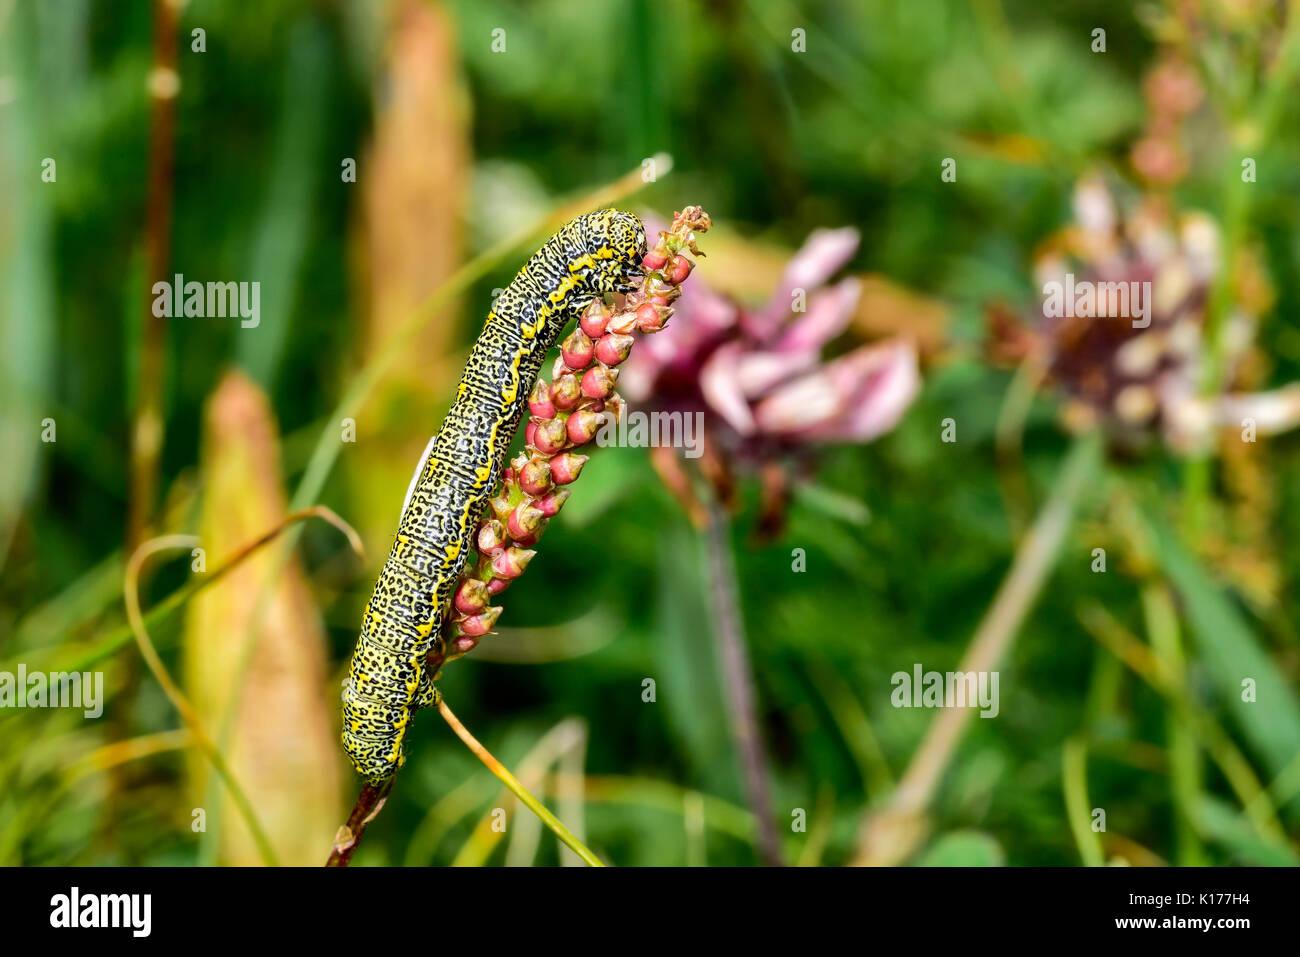 Lycia alpina - Stock Image